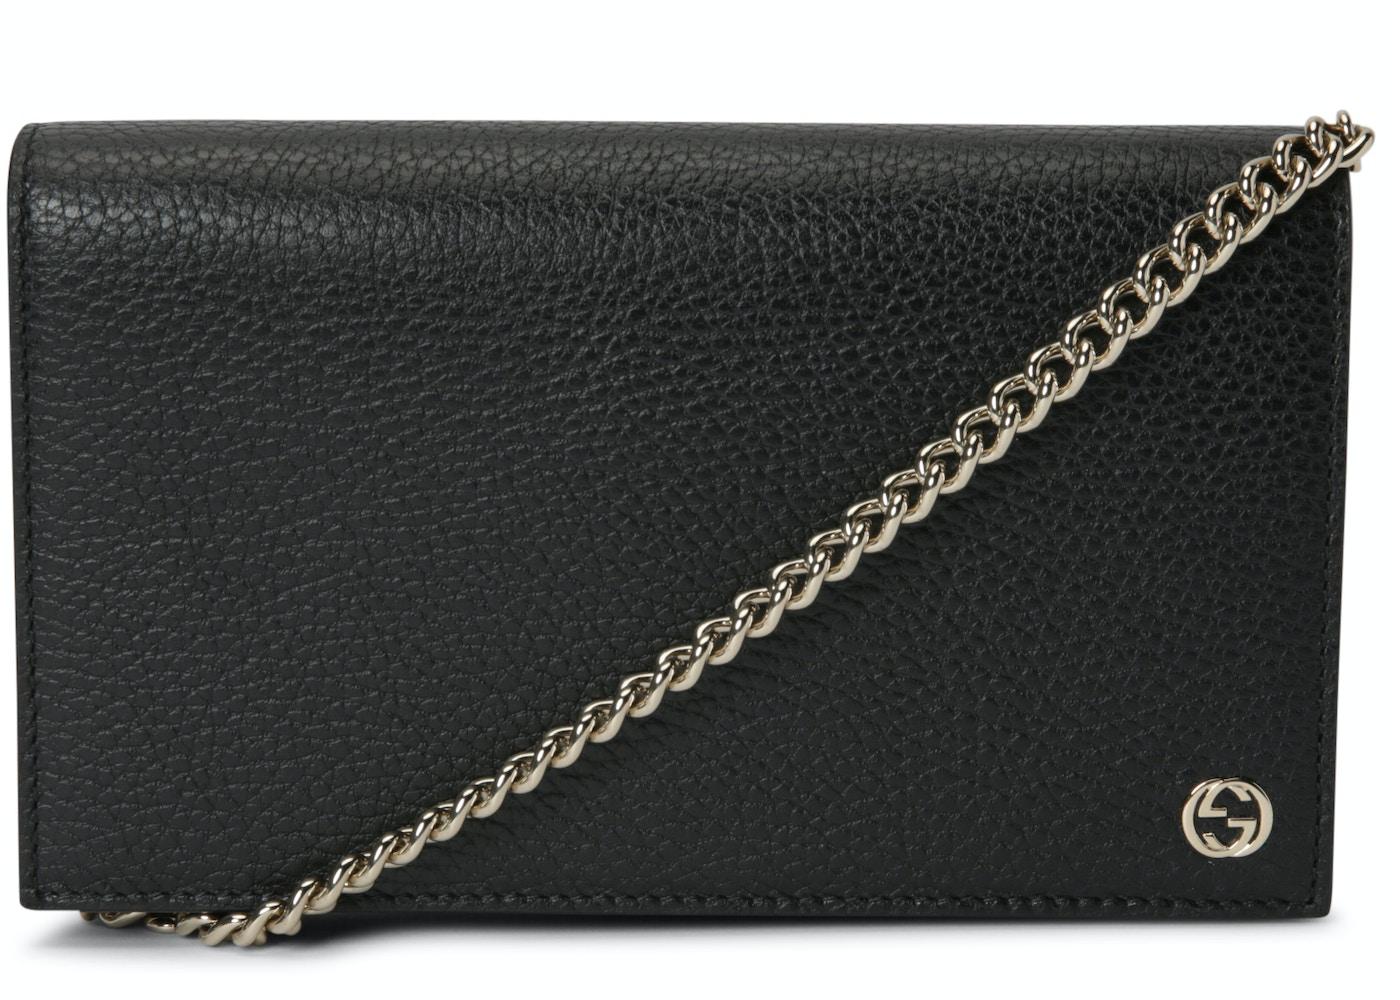 c770ddebcf23 Gucci Chain Wallet Betty GG Medium Black. GG Medium Black